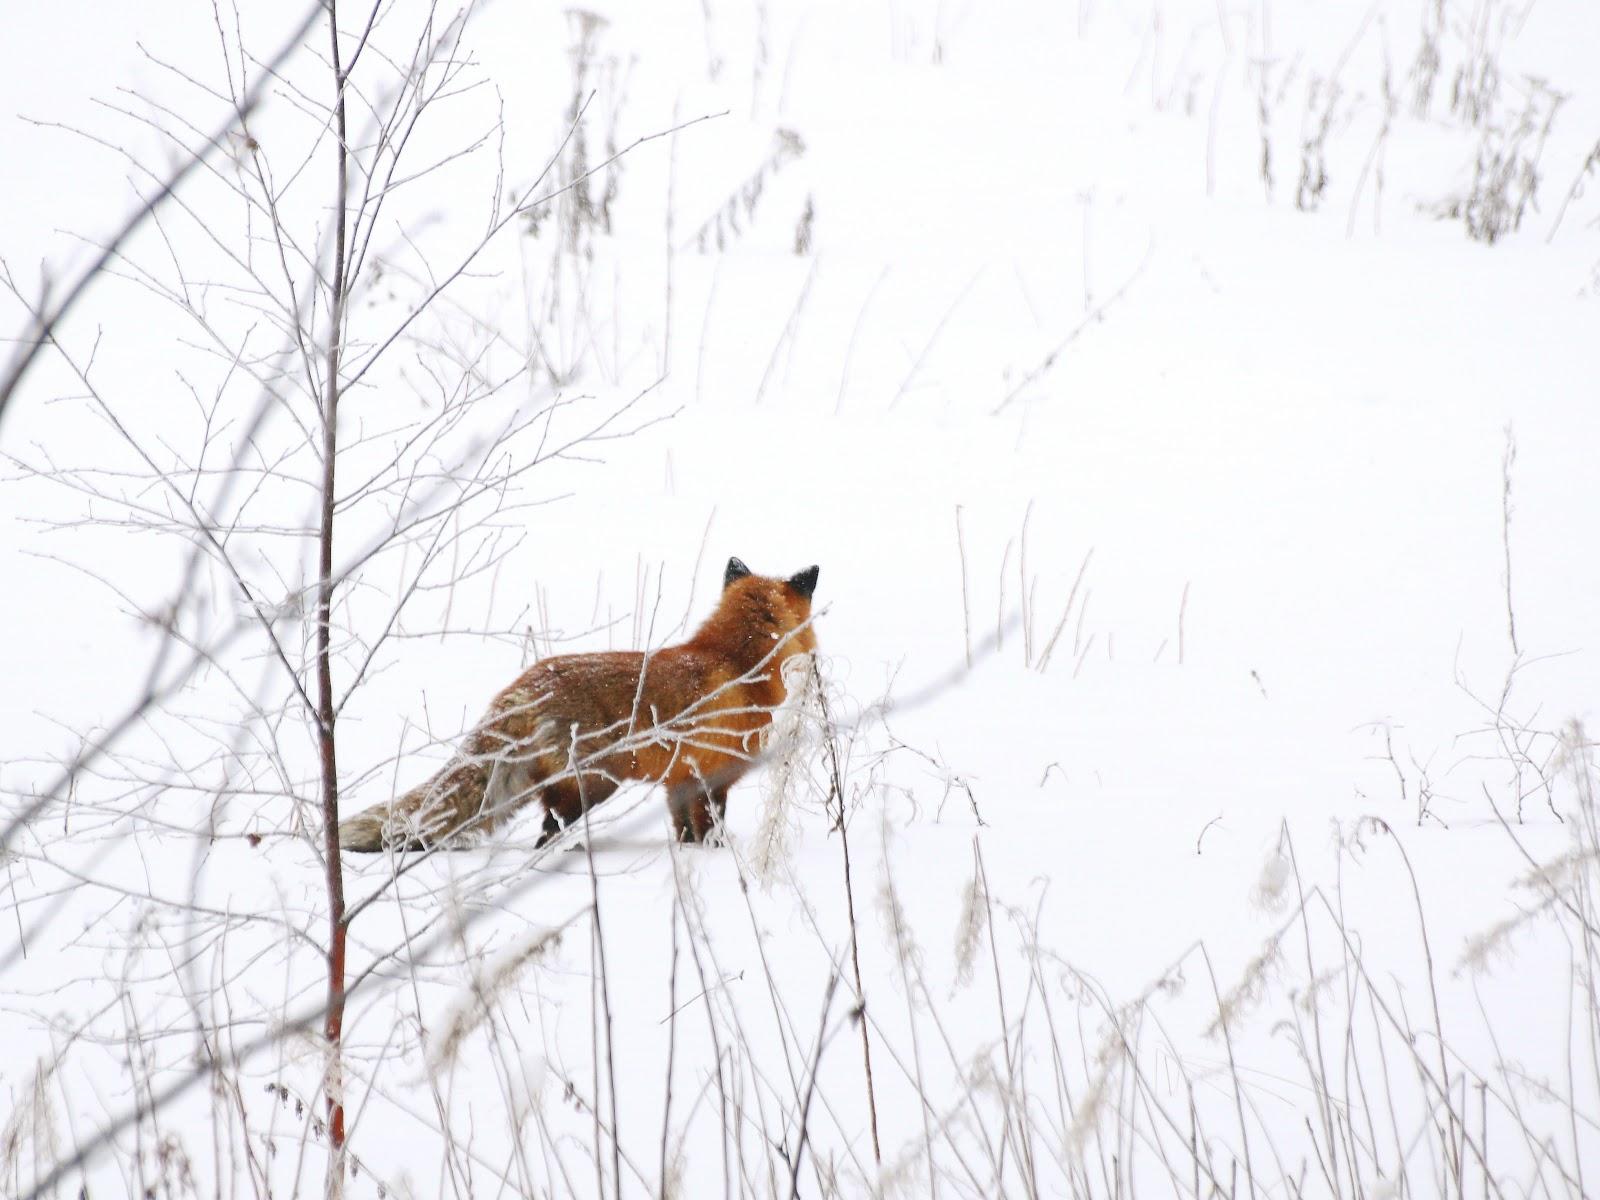 Räv fox snow photographer Norrland Sweden Maria-Thérèse Sommar fotograf Härnösand High Coast